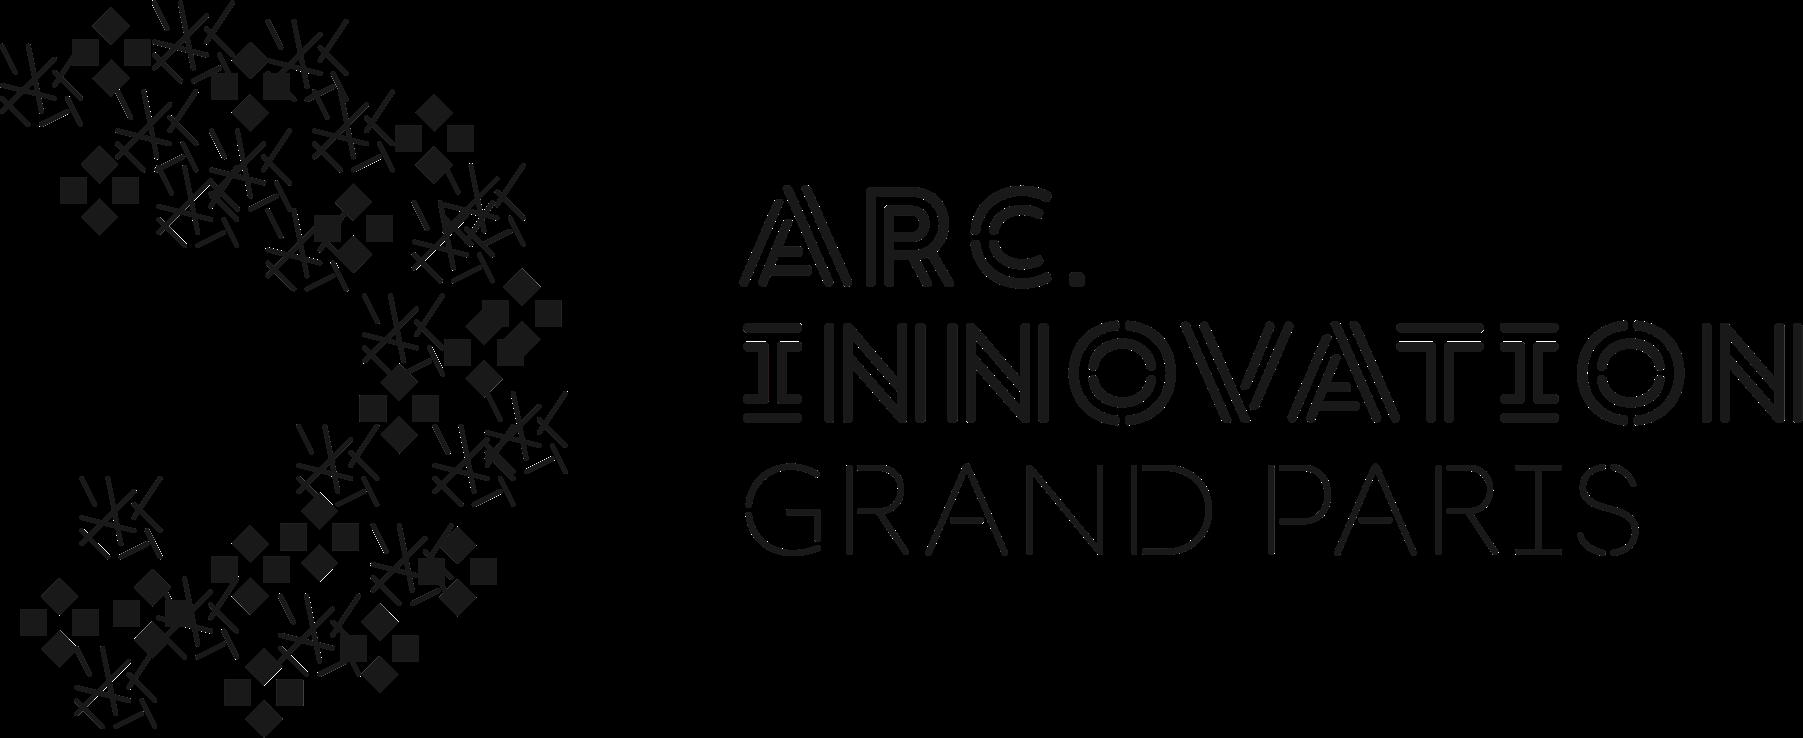 Logo de la startup Arc de l'innovation